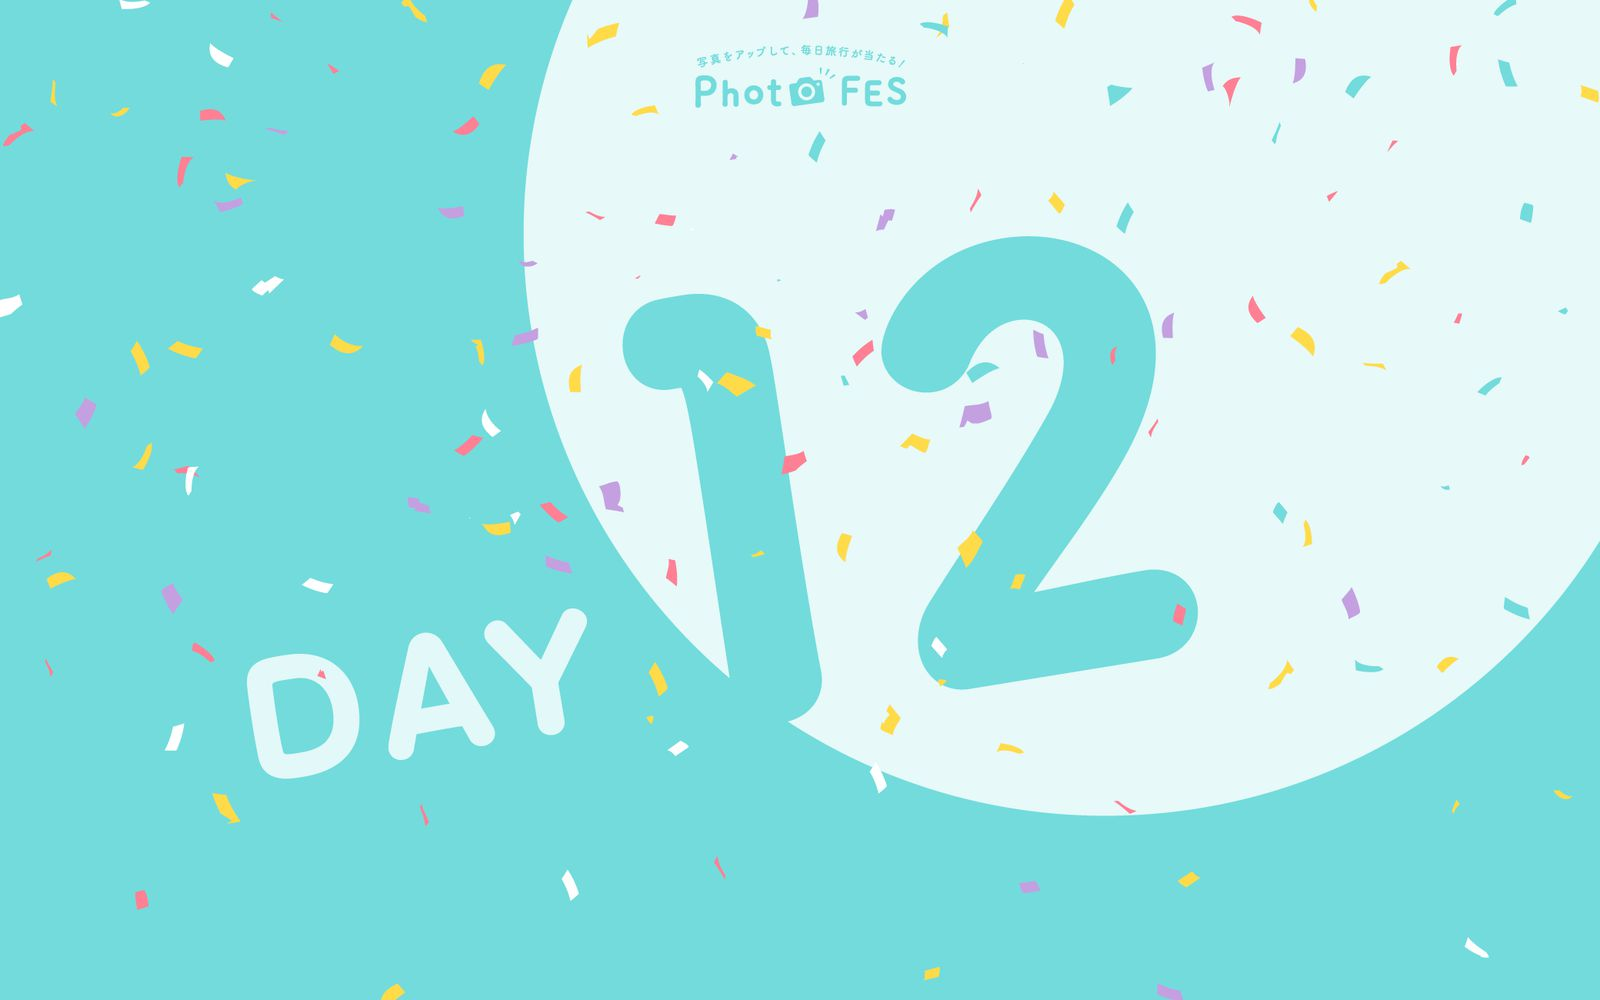 【DAY12】「Photo FES Summer」7月24日投稿分であたる賞品&受賞者発表